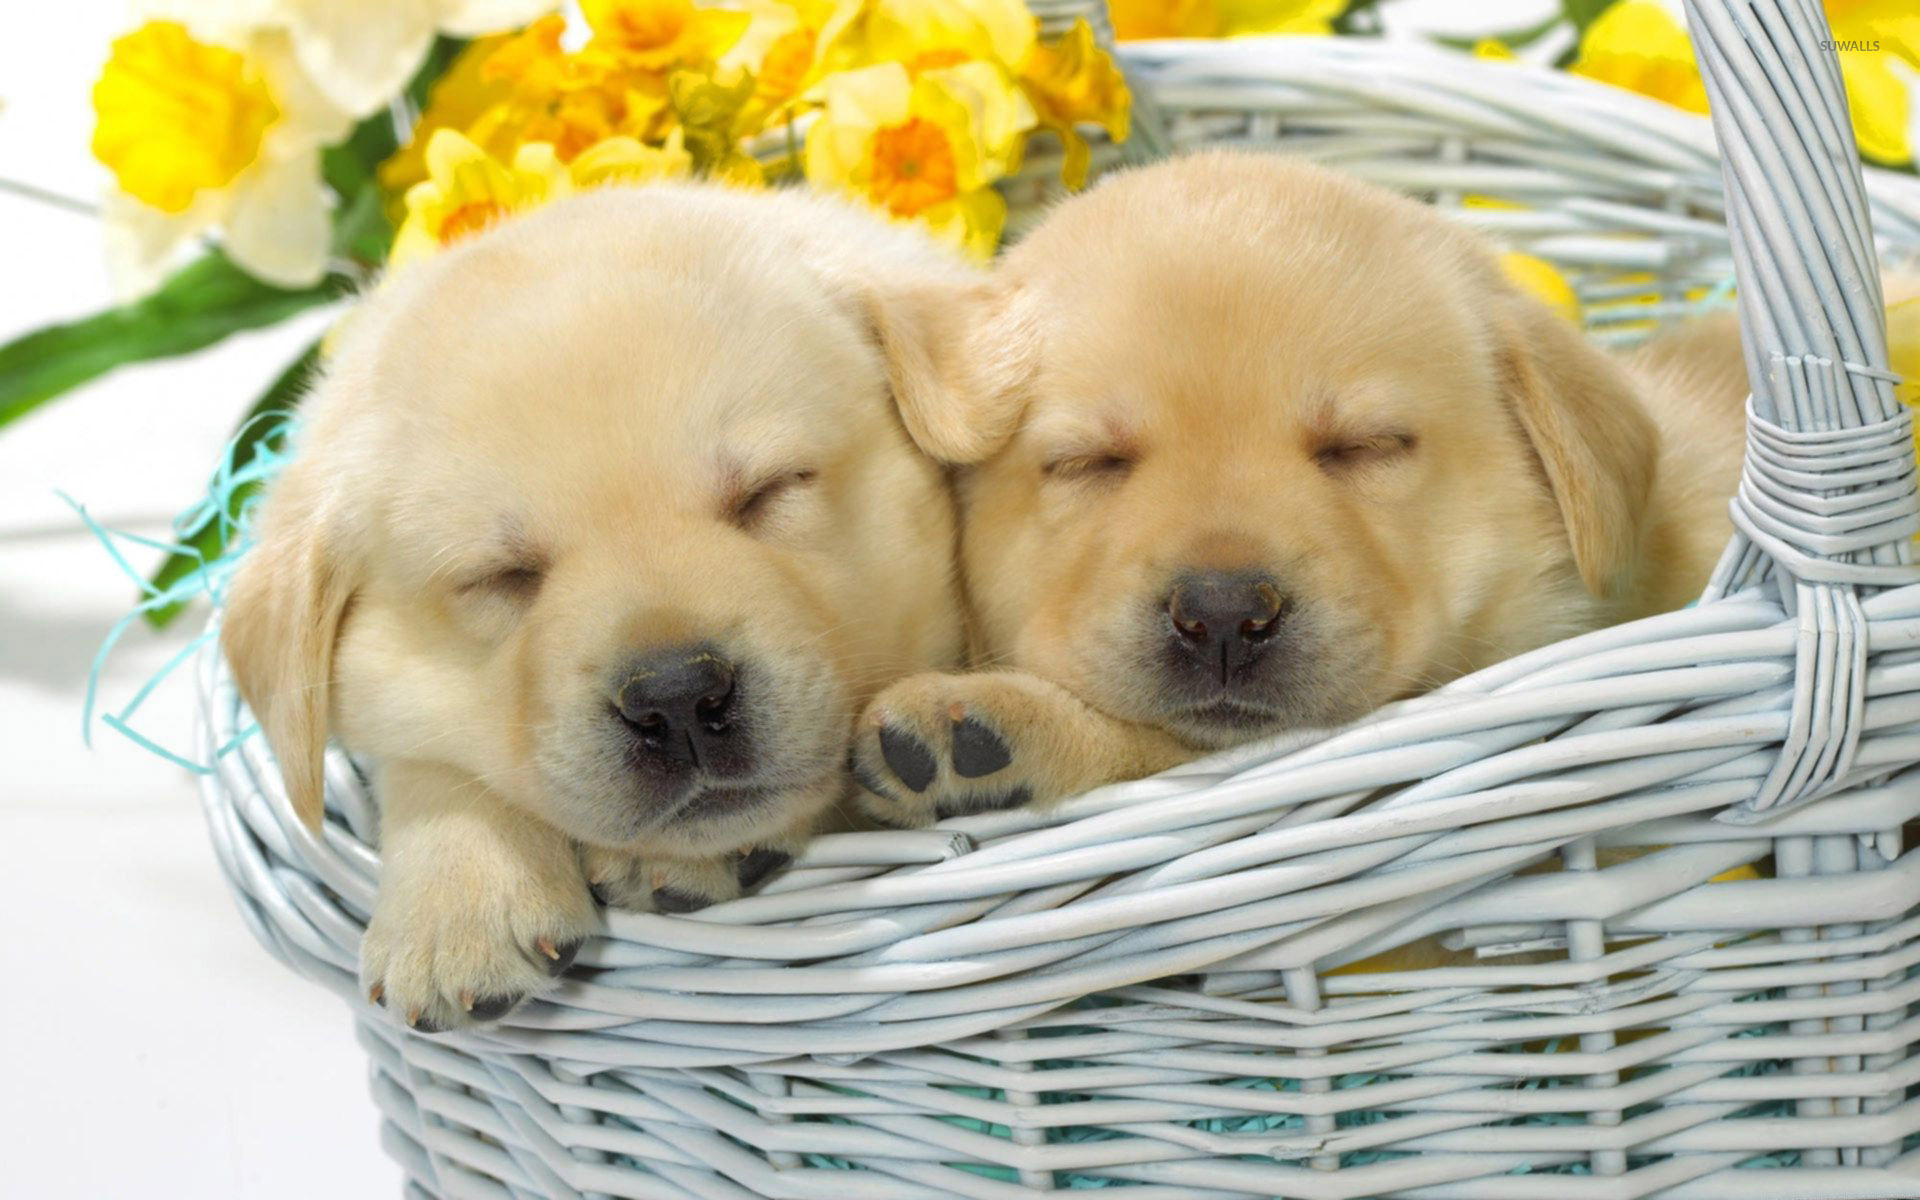 Cute puppies sleeping in a straw basket wallpaper Animal